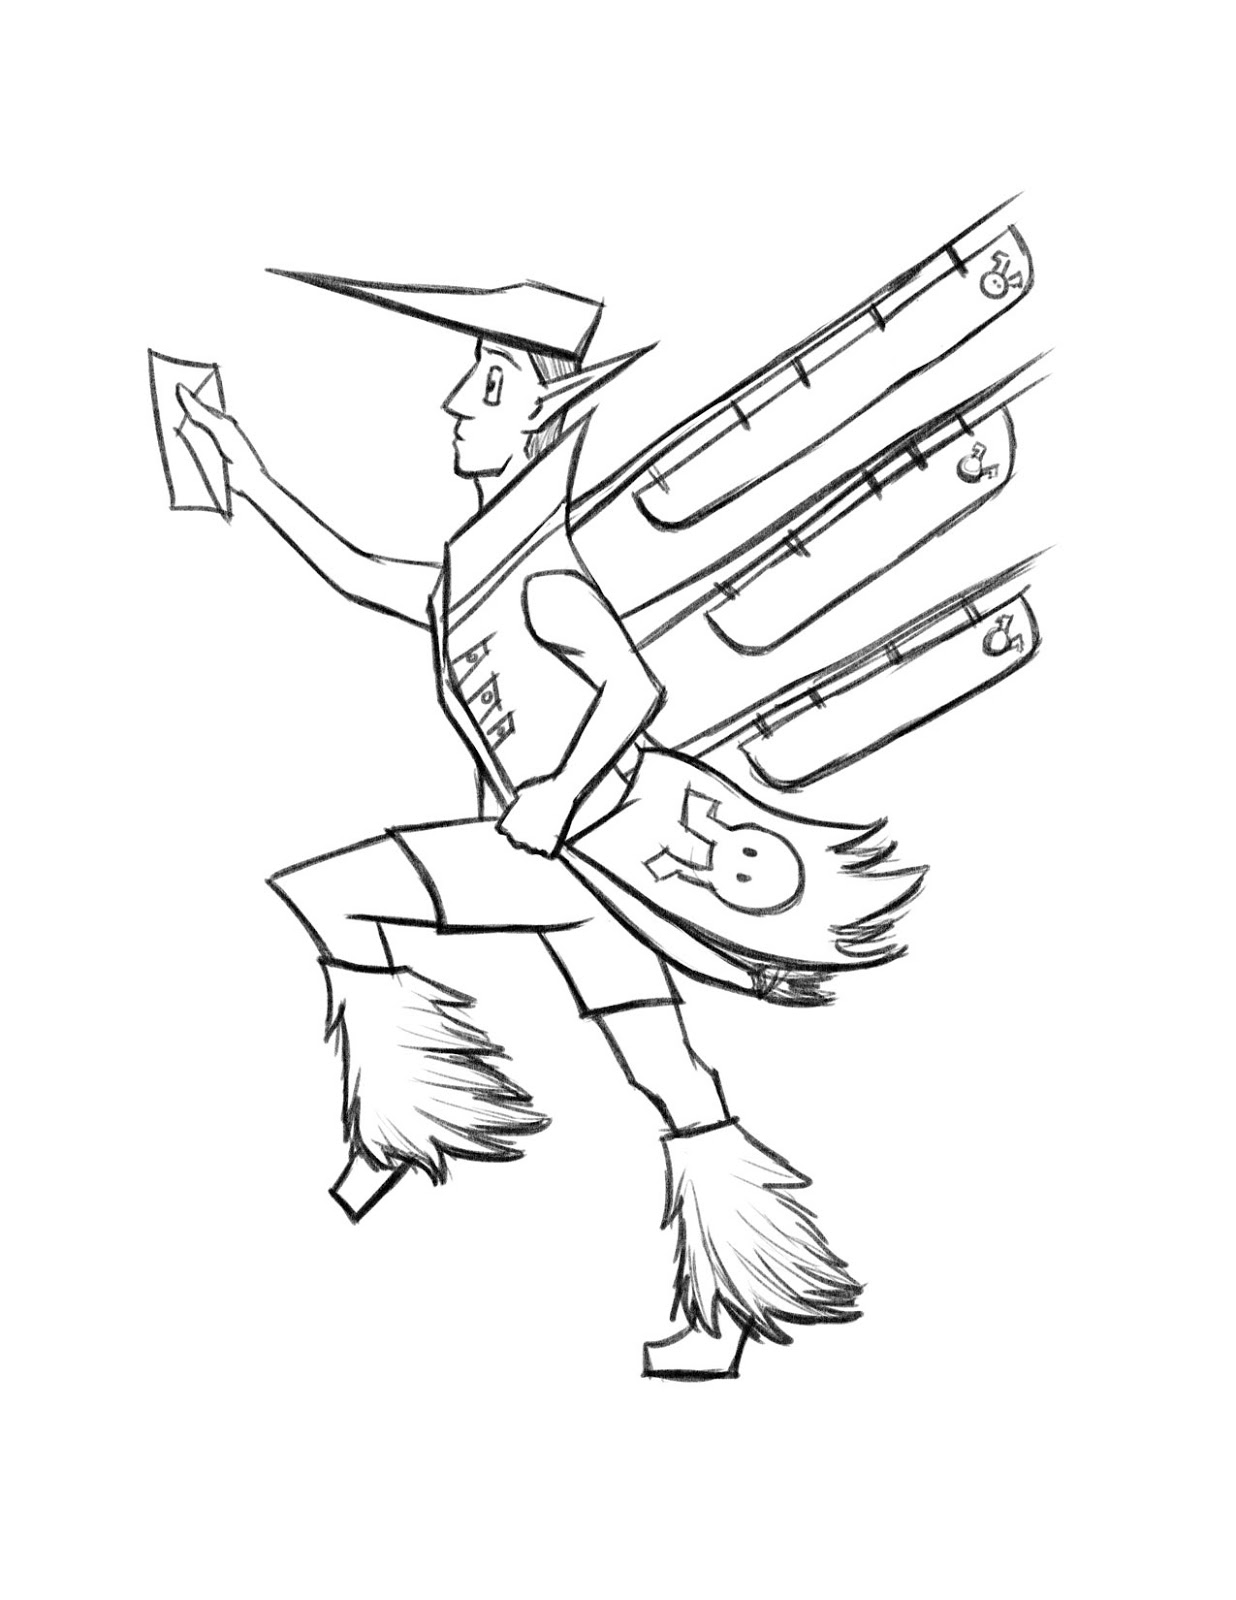 Mailman Drawing At Getdrawings